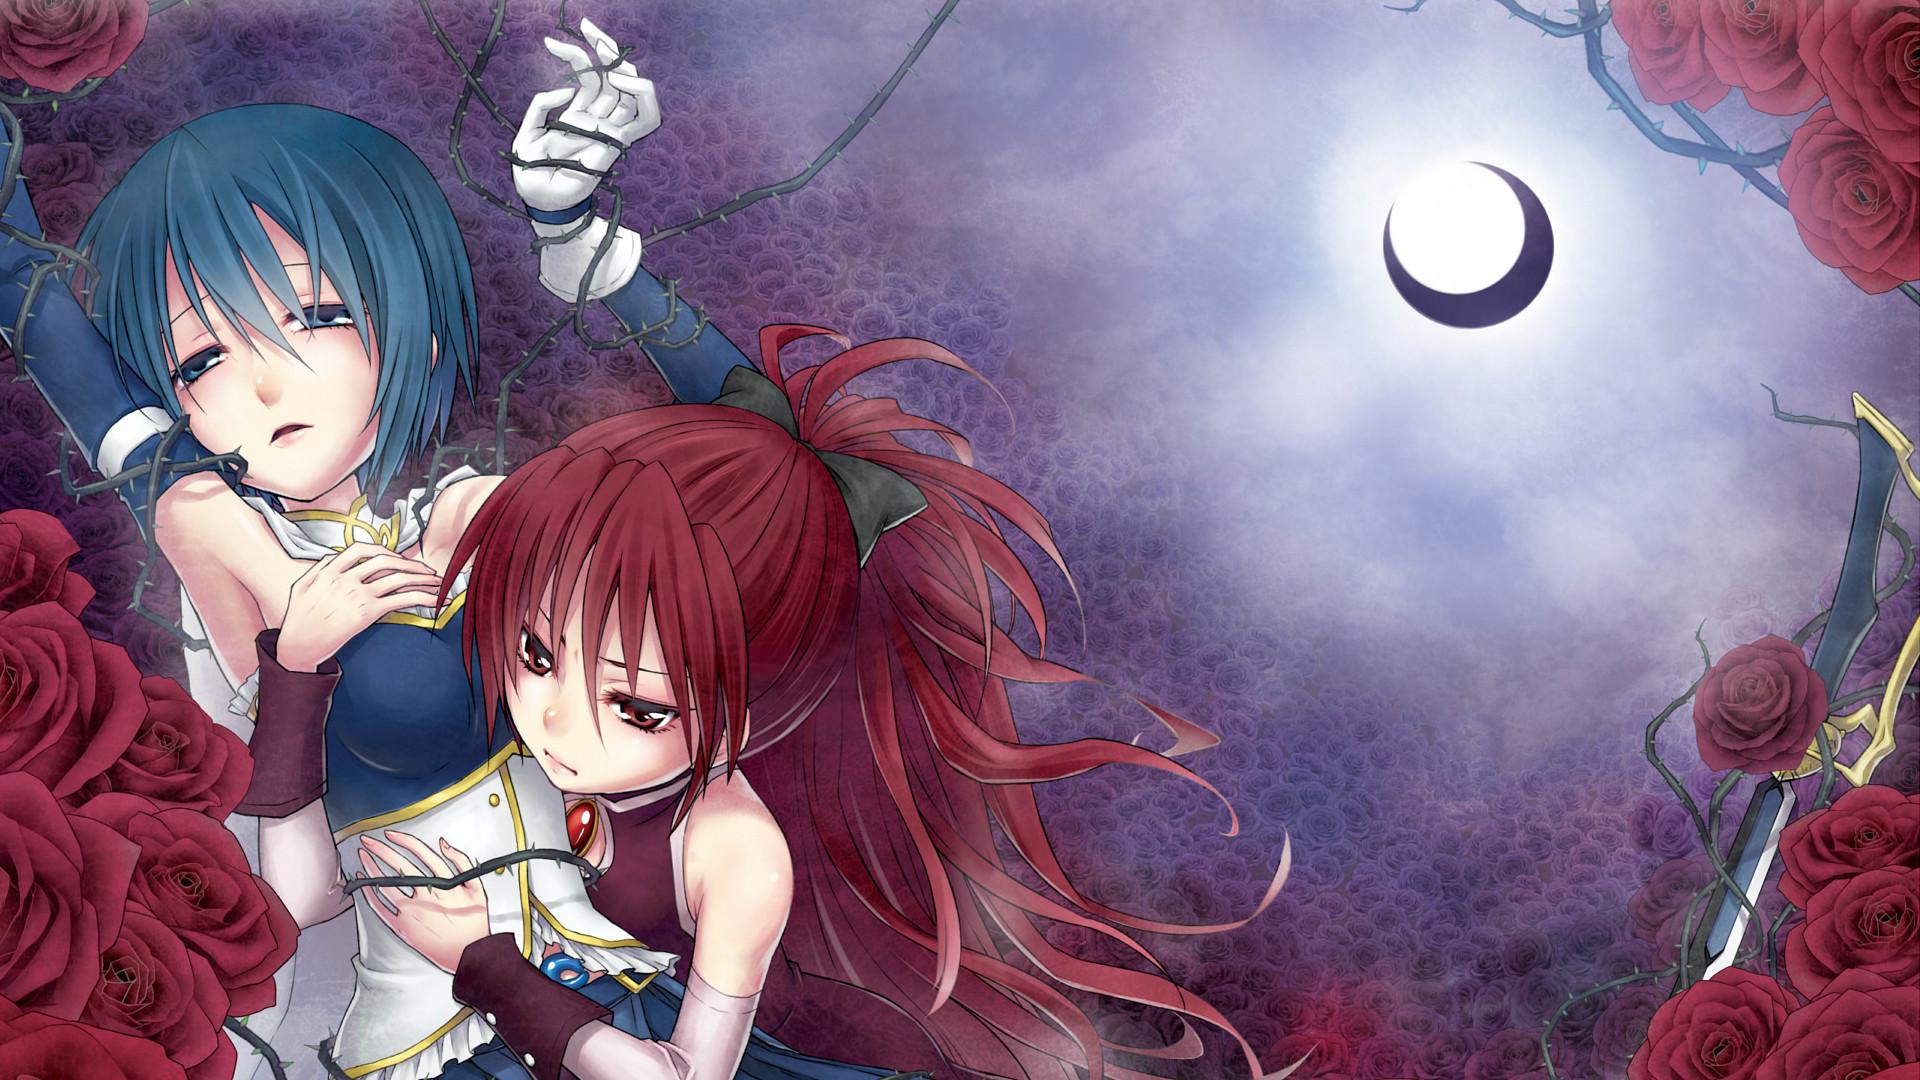 Anime Cute Lesbians yuri wallpaper anime (74+ images)